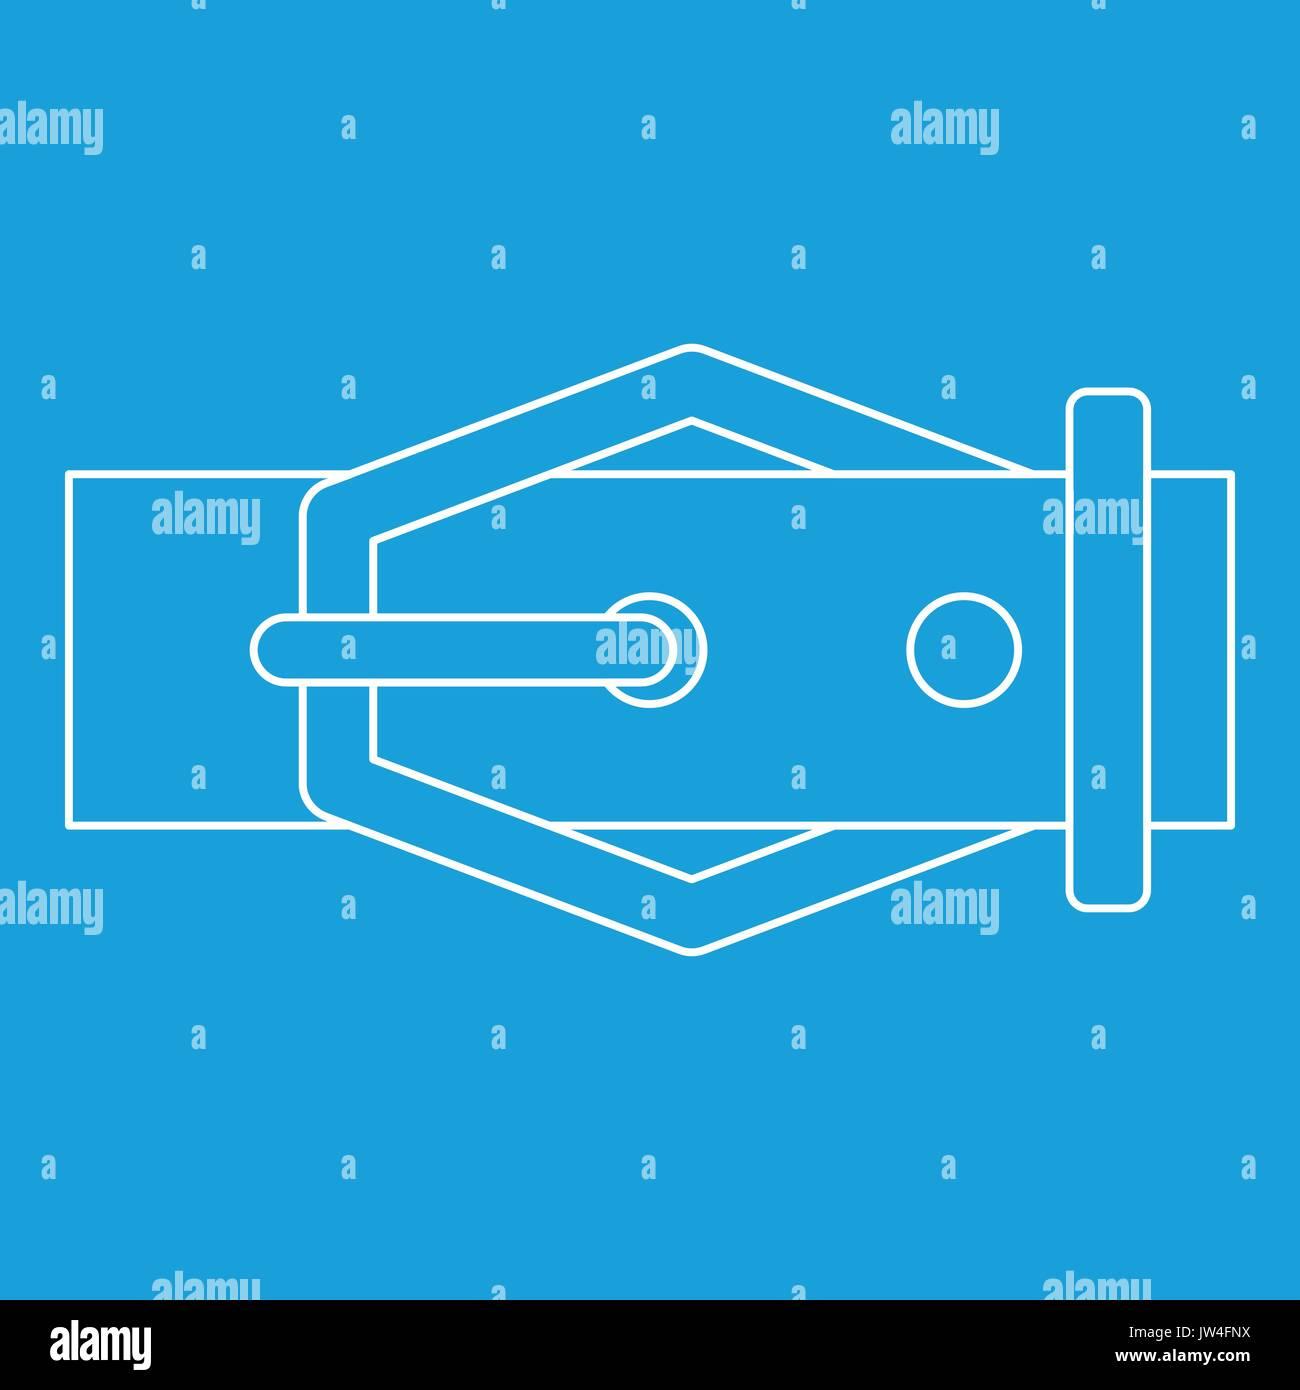 Thin Belt Stock Photos & Thin Belt Stock Images - Alamy